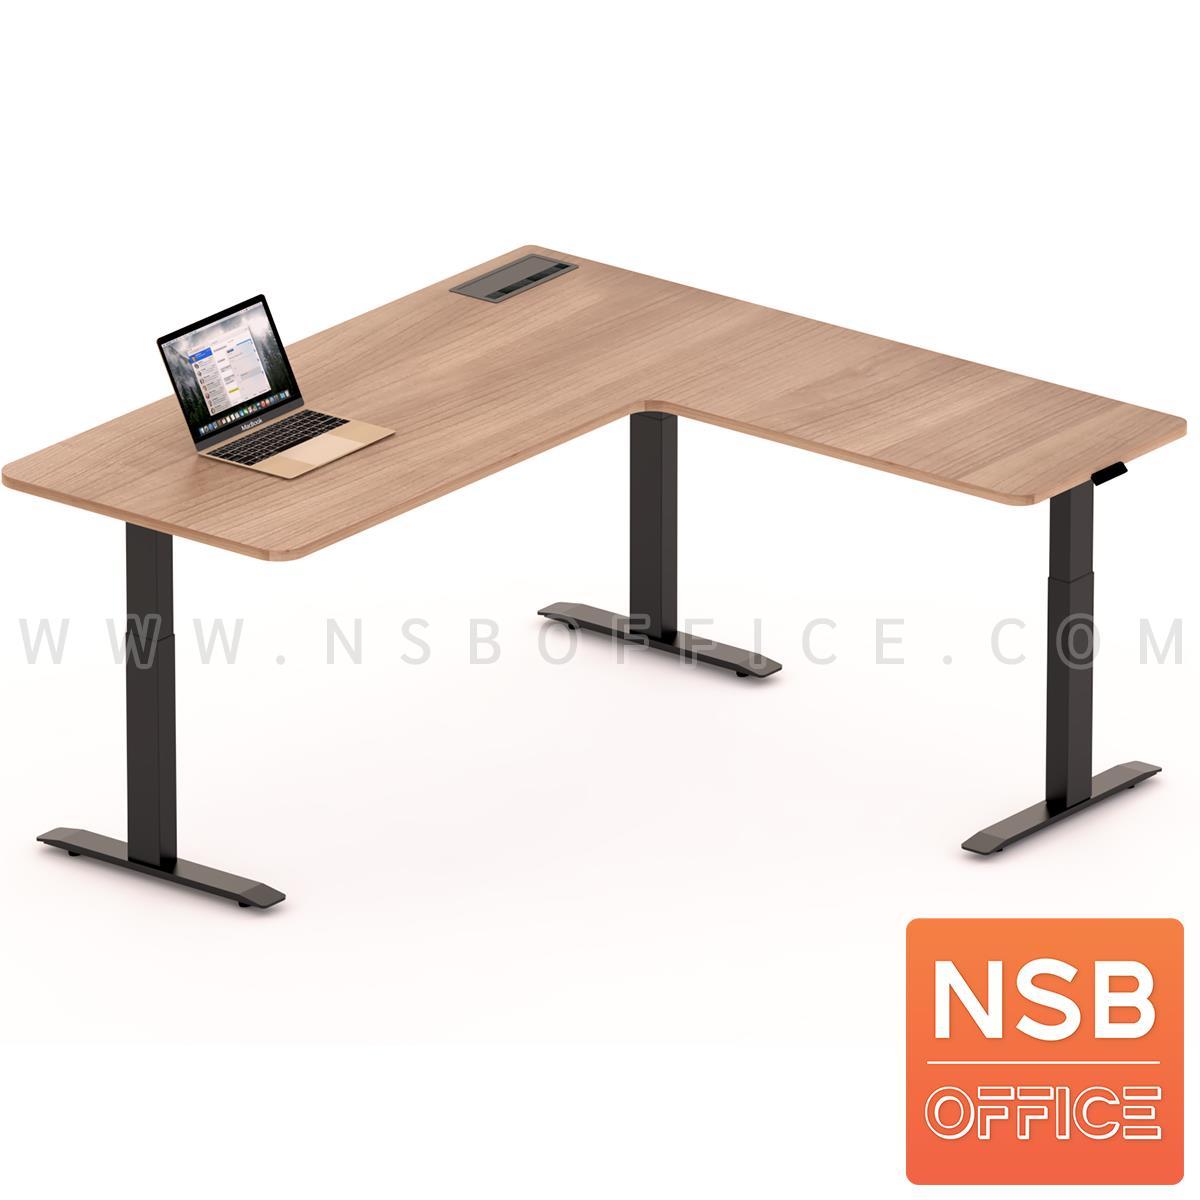 A44A001:โต๊ะทำงานปรับระดับ Sit 2 Stand ทรงตัวแอล รุ่น Carmelo (คาร์เมโล่) ขนาด 160W, 180W cm.  พร้อมป็อปอัพรุ่น A24A057